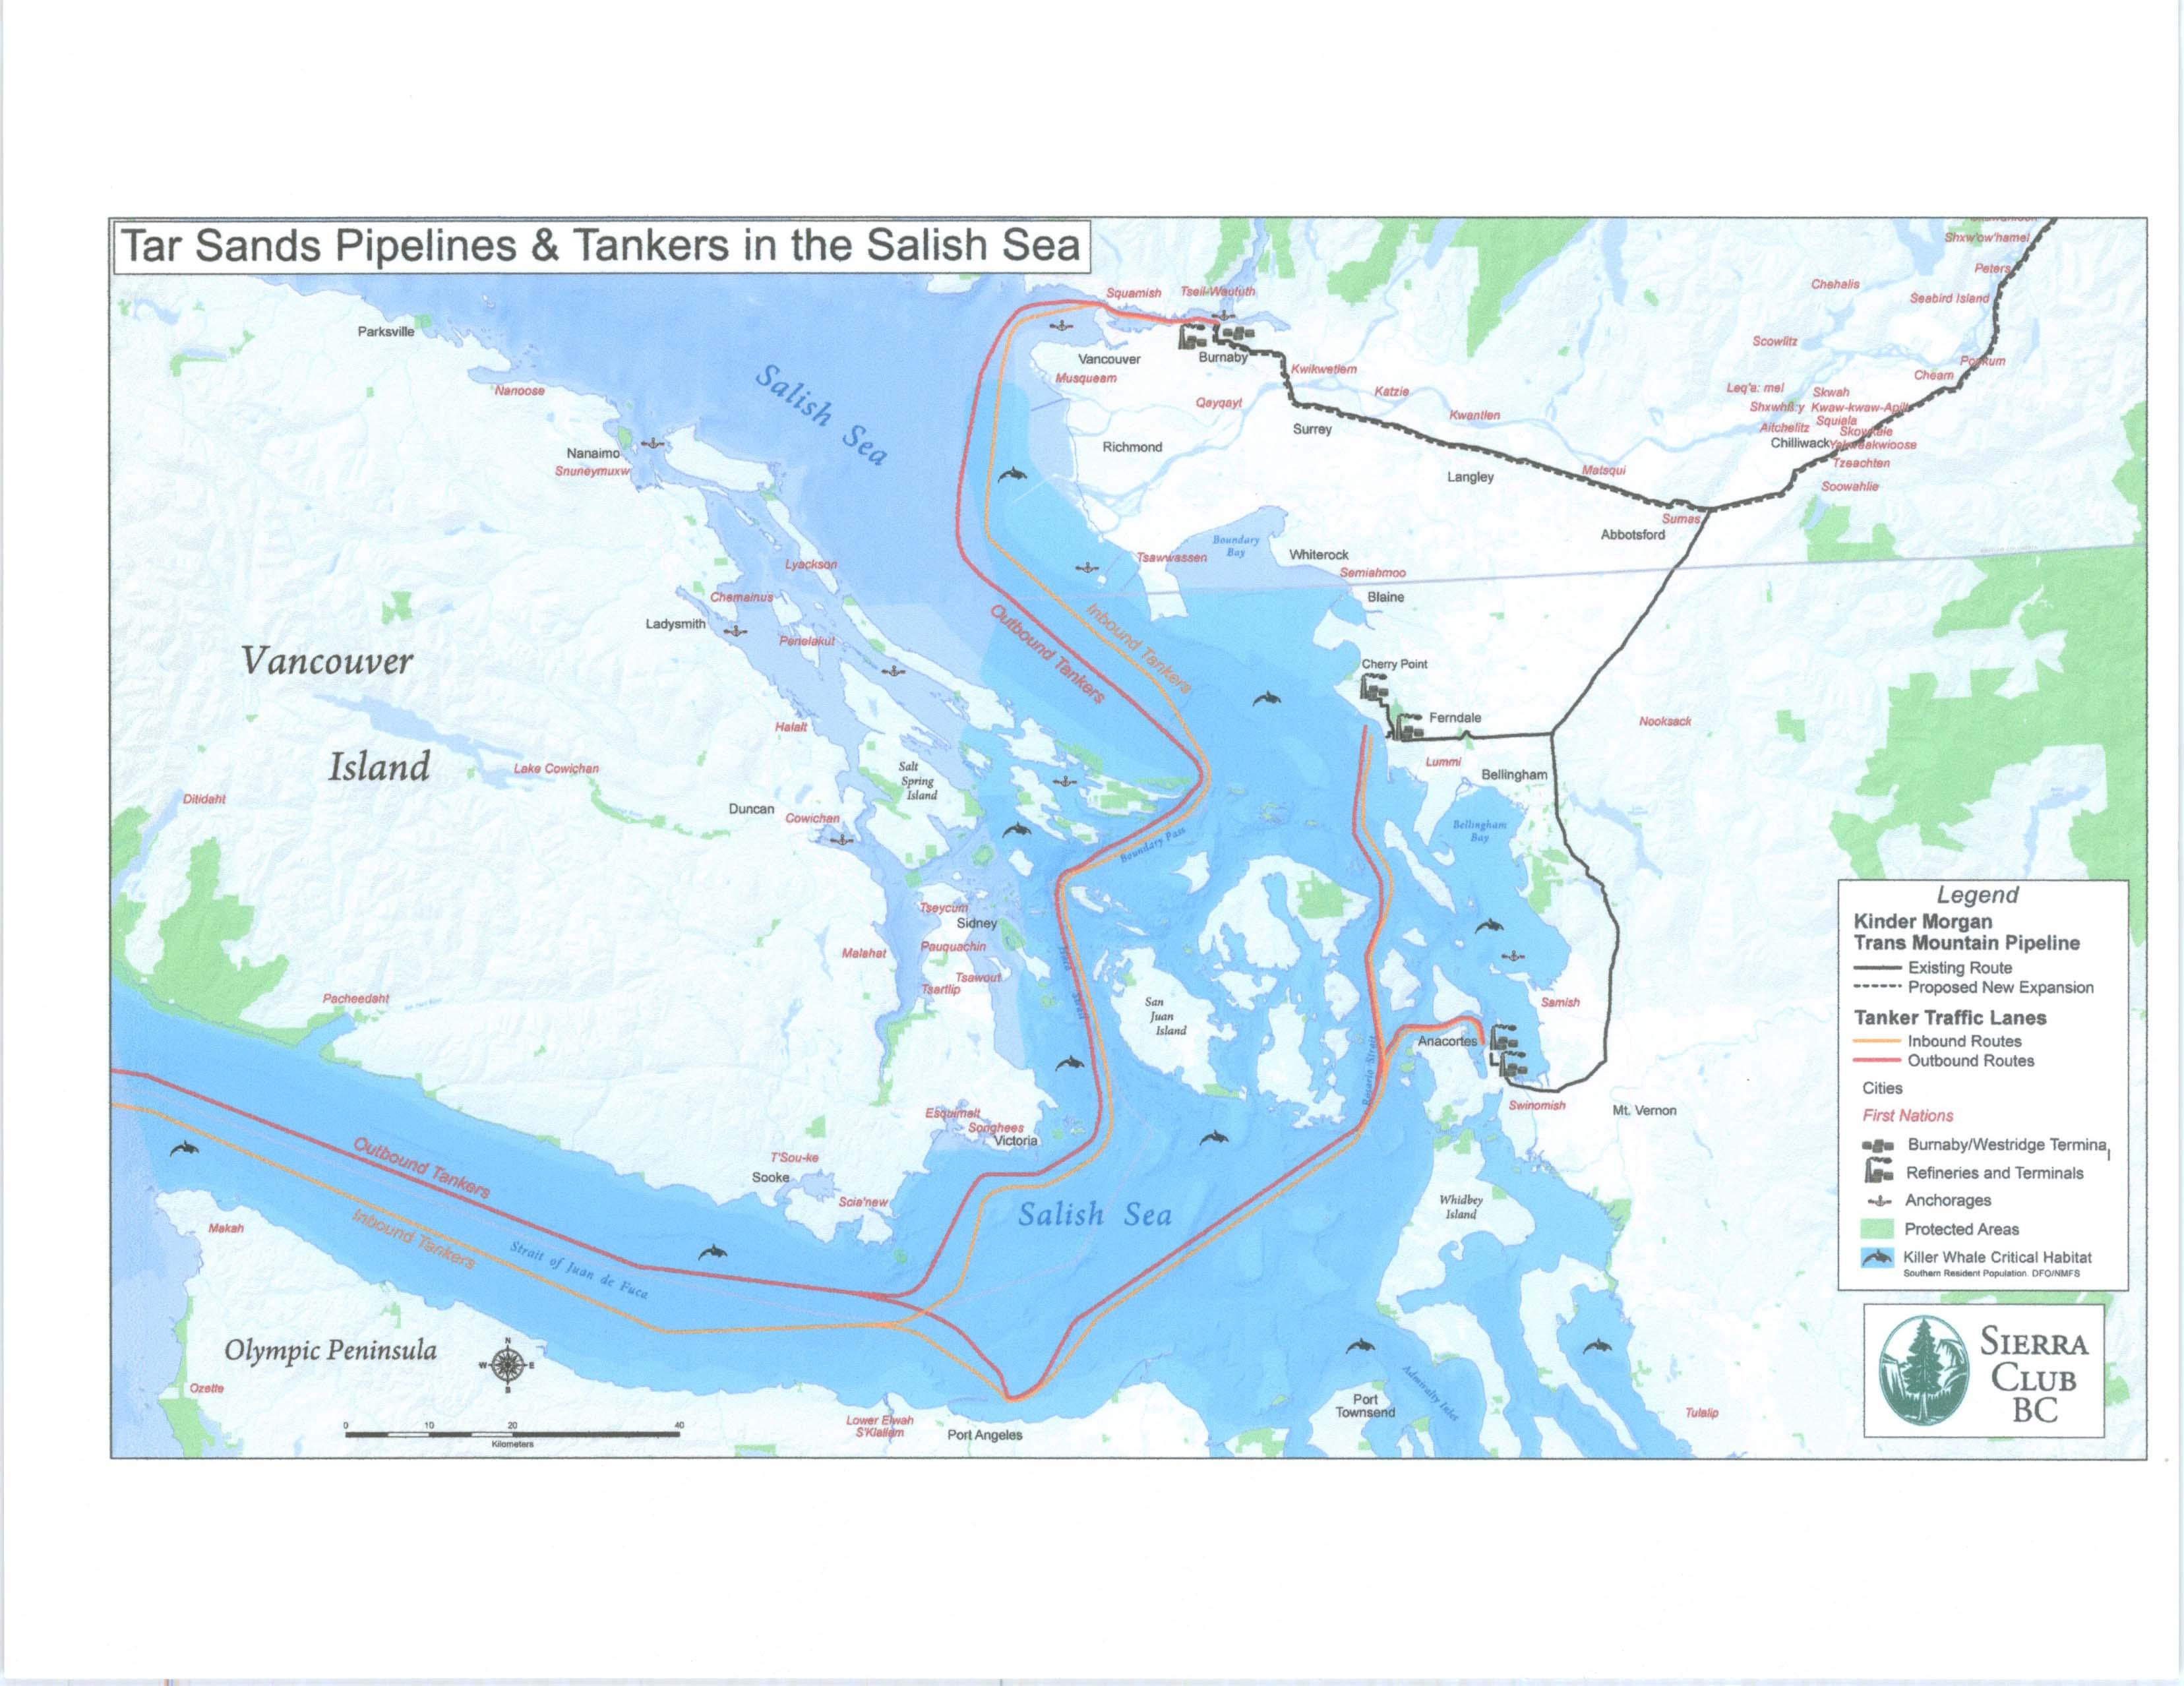 Oil Tanker Route through the Salish Sea